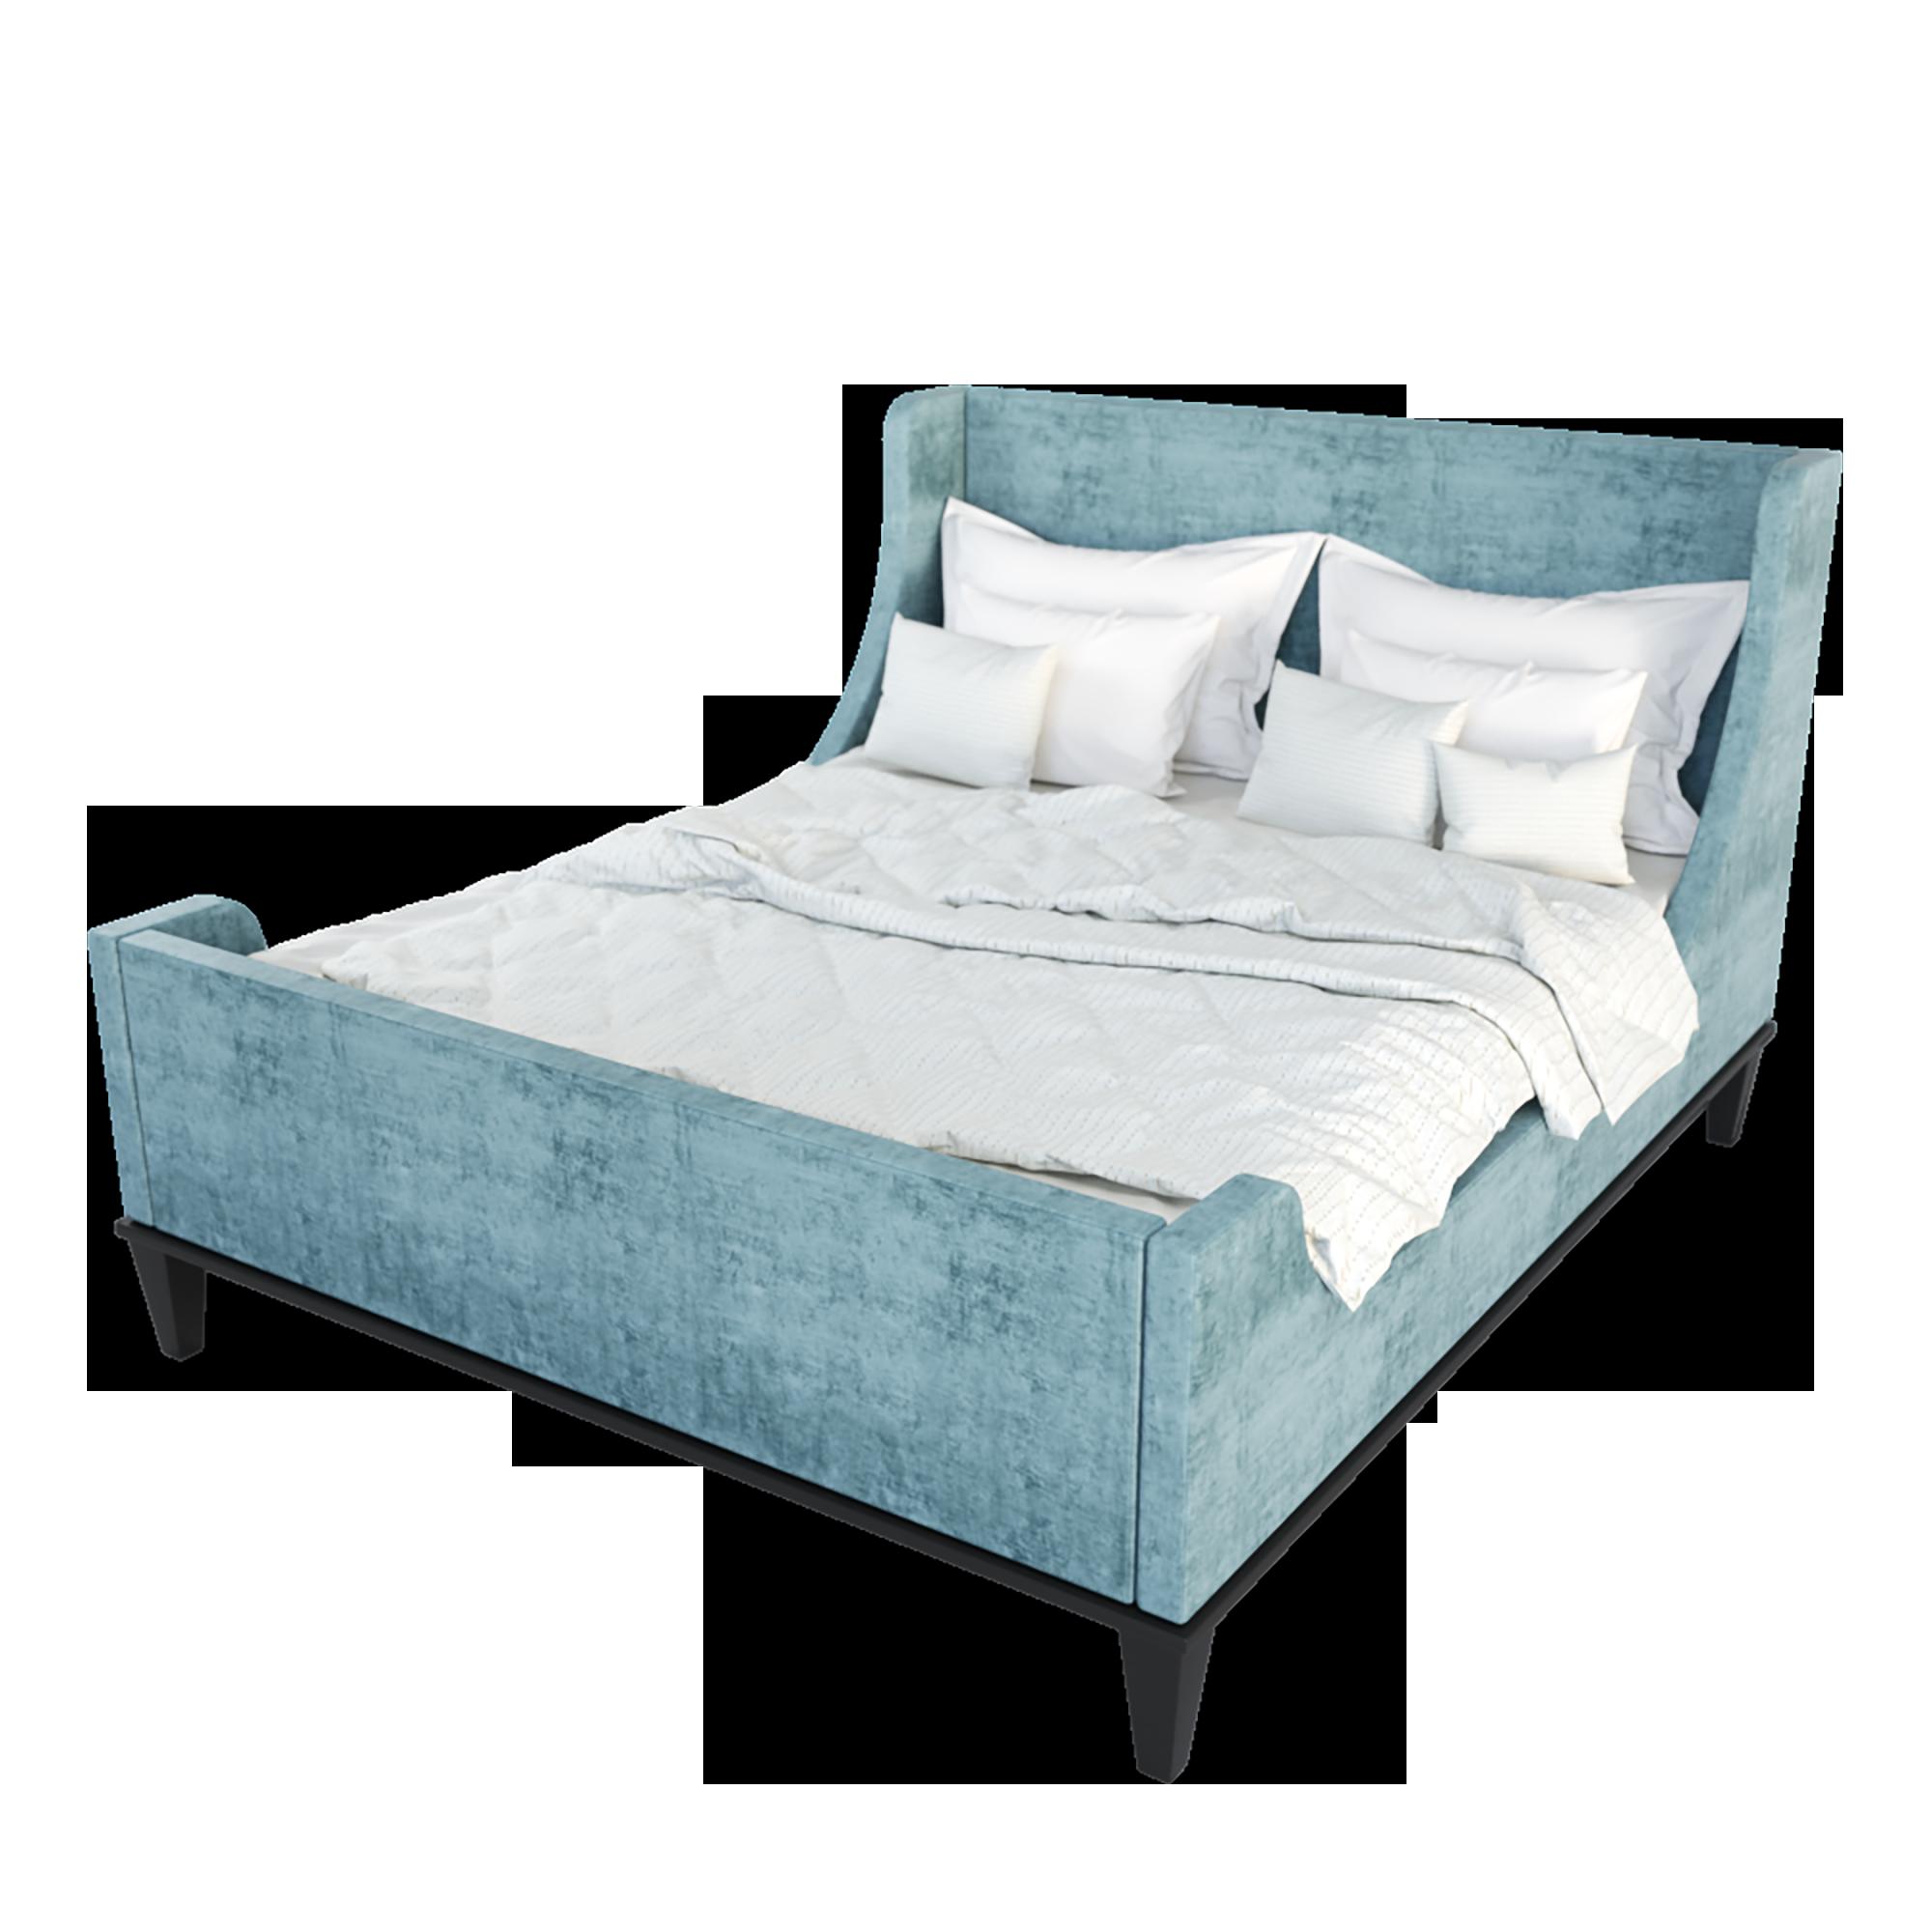 Кровать K002 Any-Home - K002 | AnyHome.ru